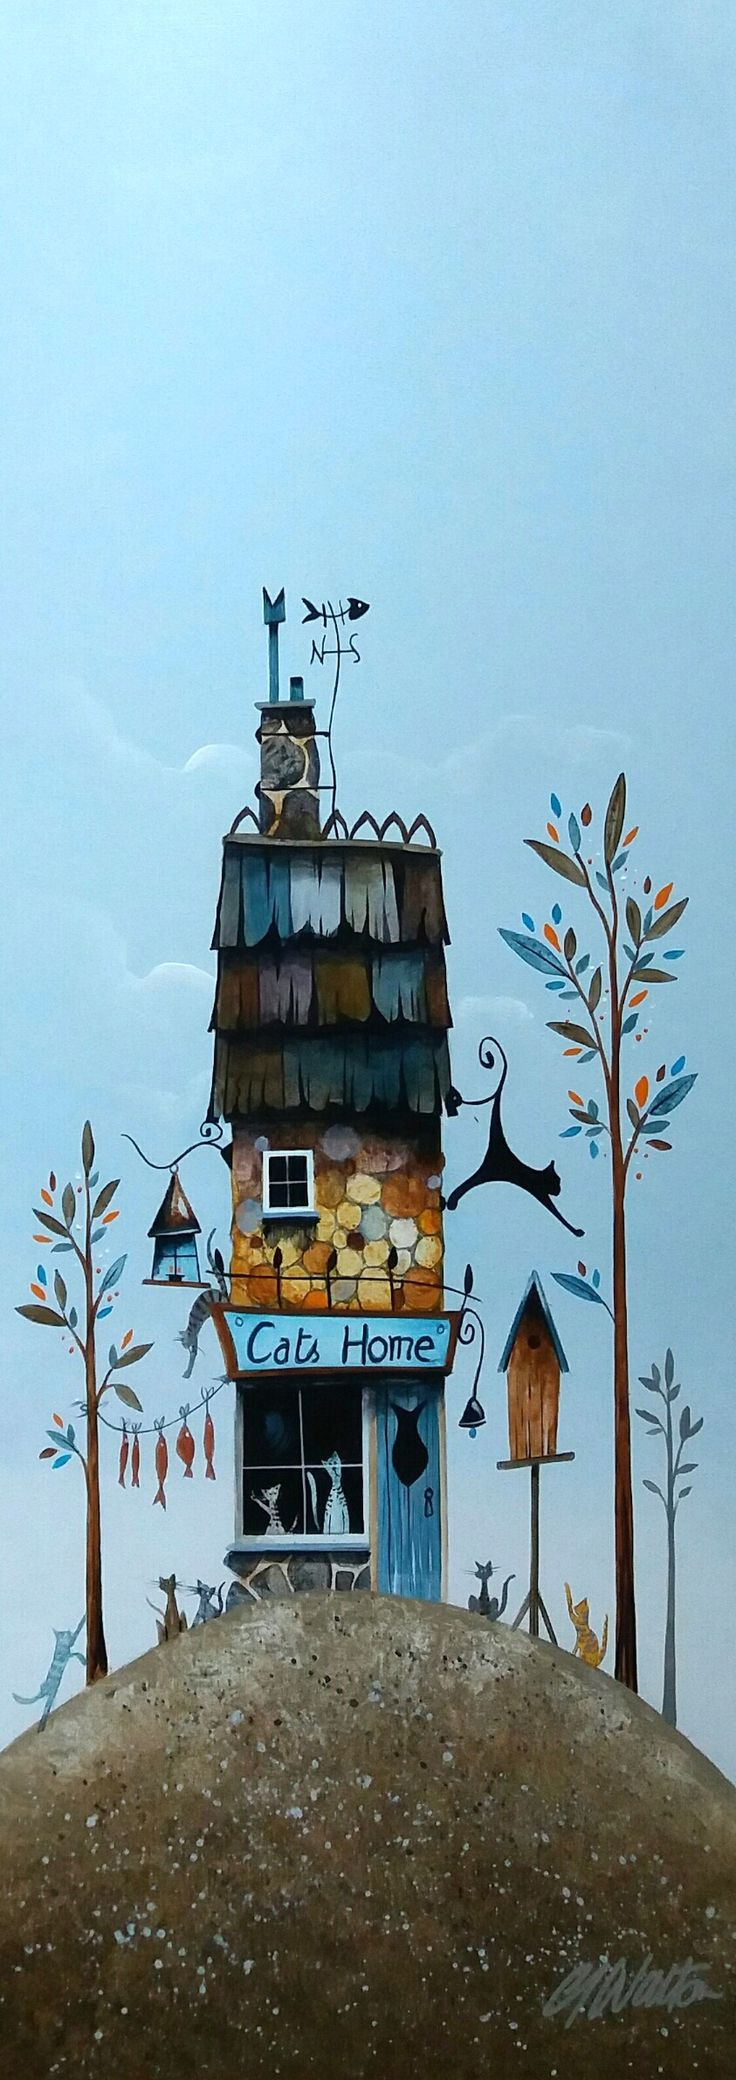 gary-walton---cats-home-iii